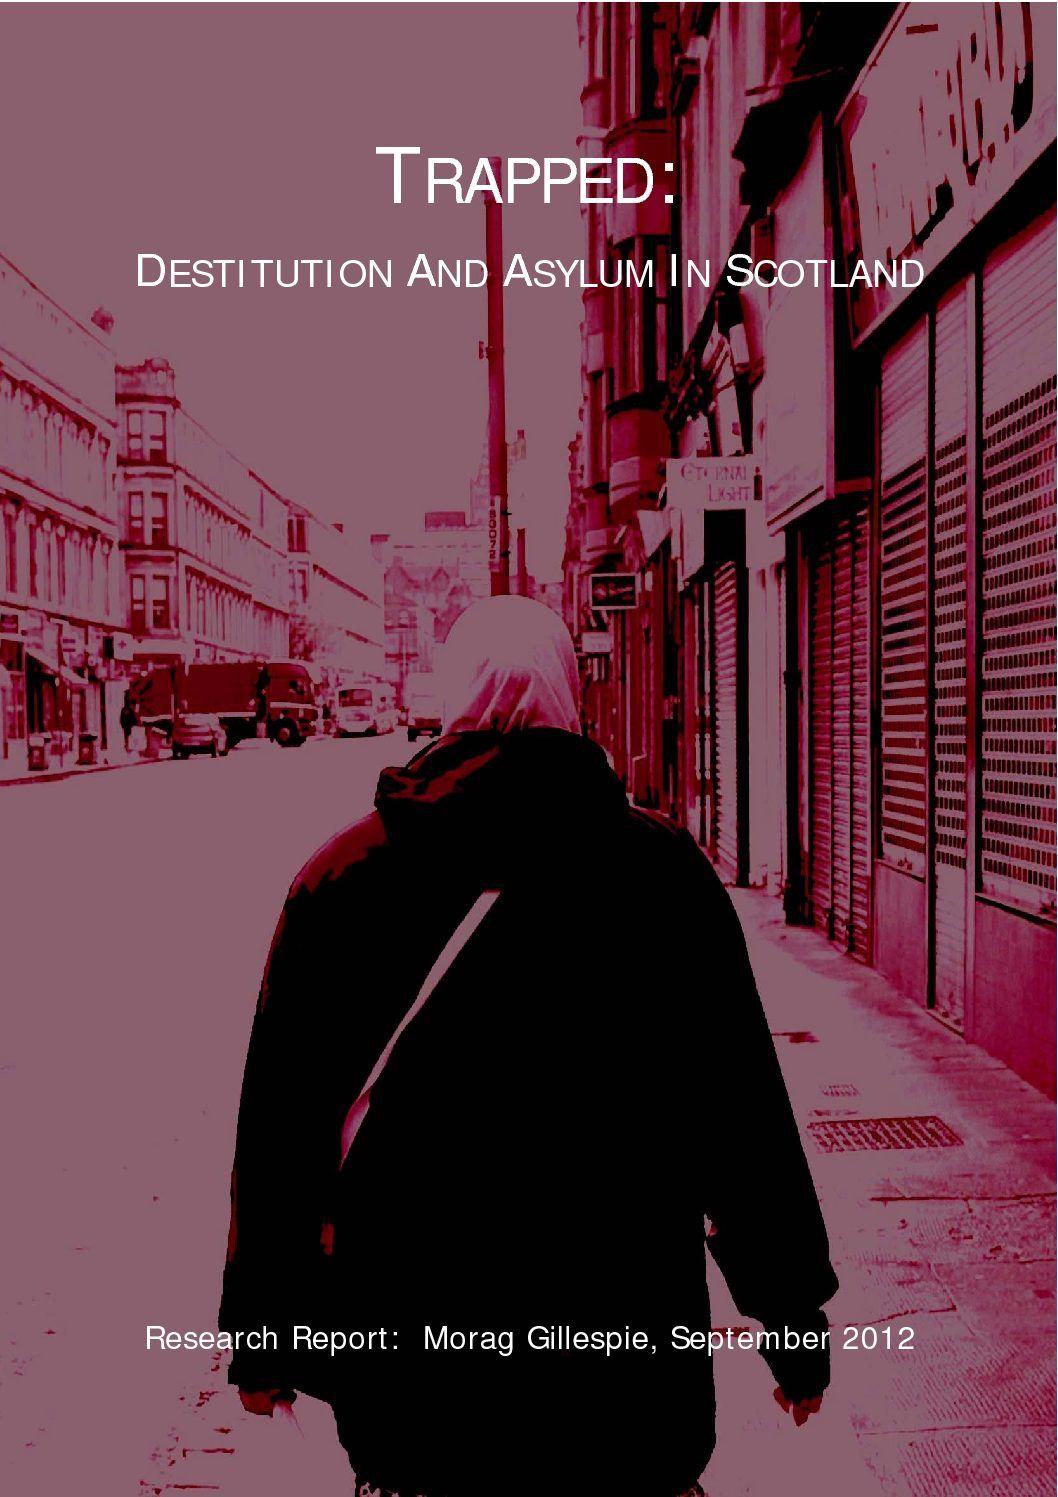 Trapped-Destitution-and-asylum-in-Scotland-PDF-pdf